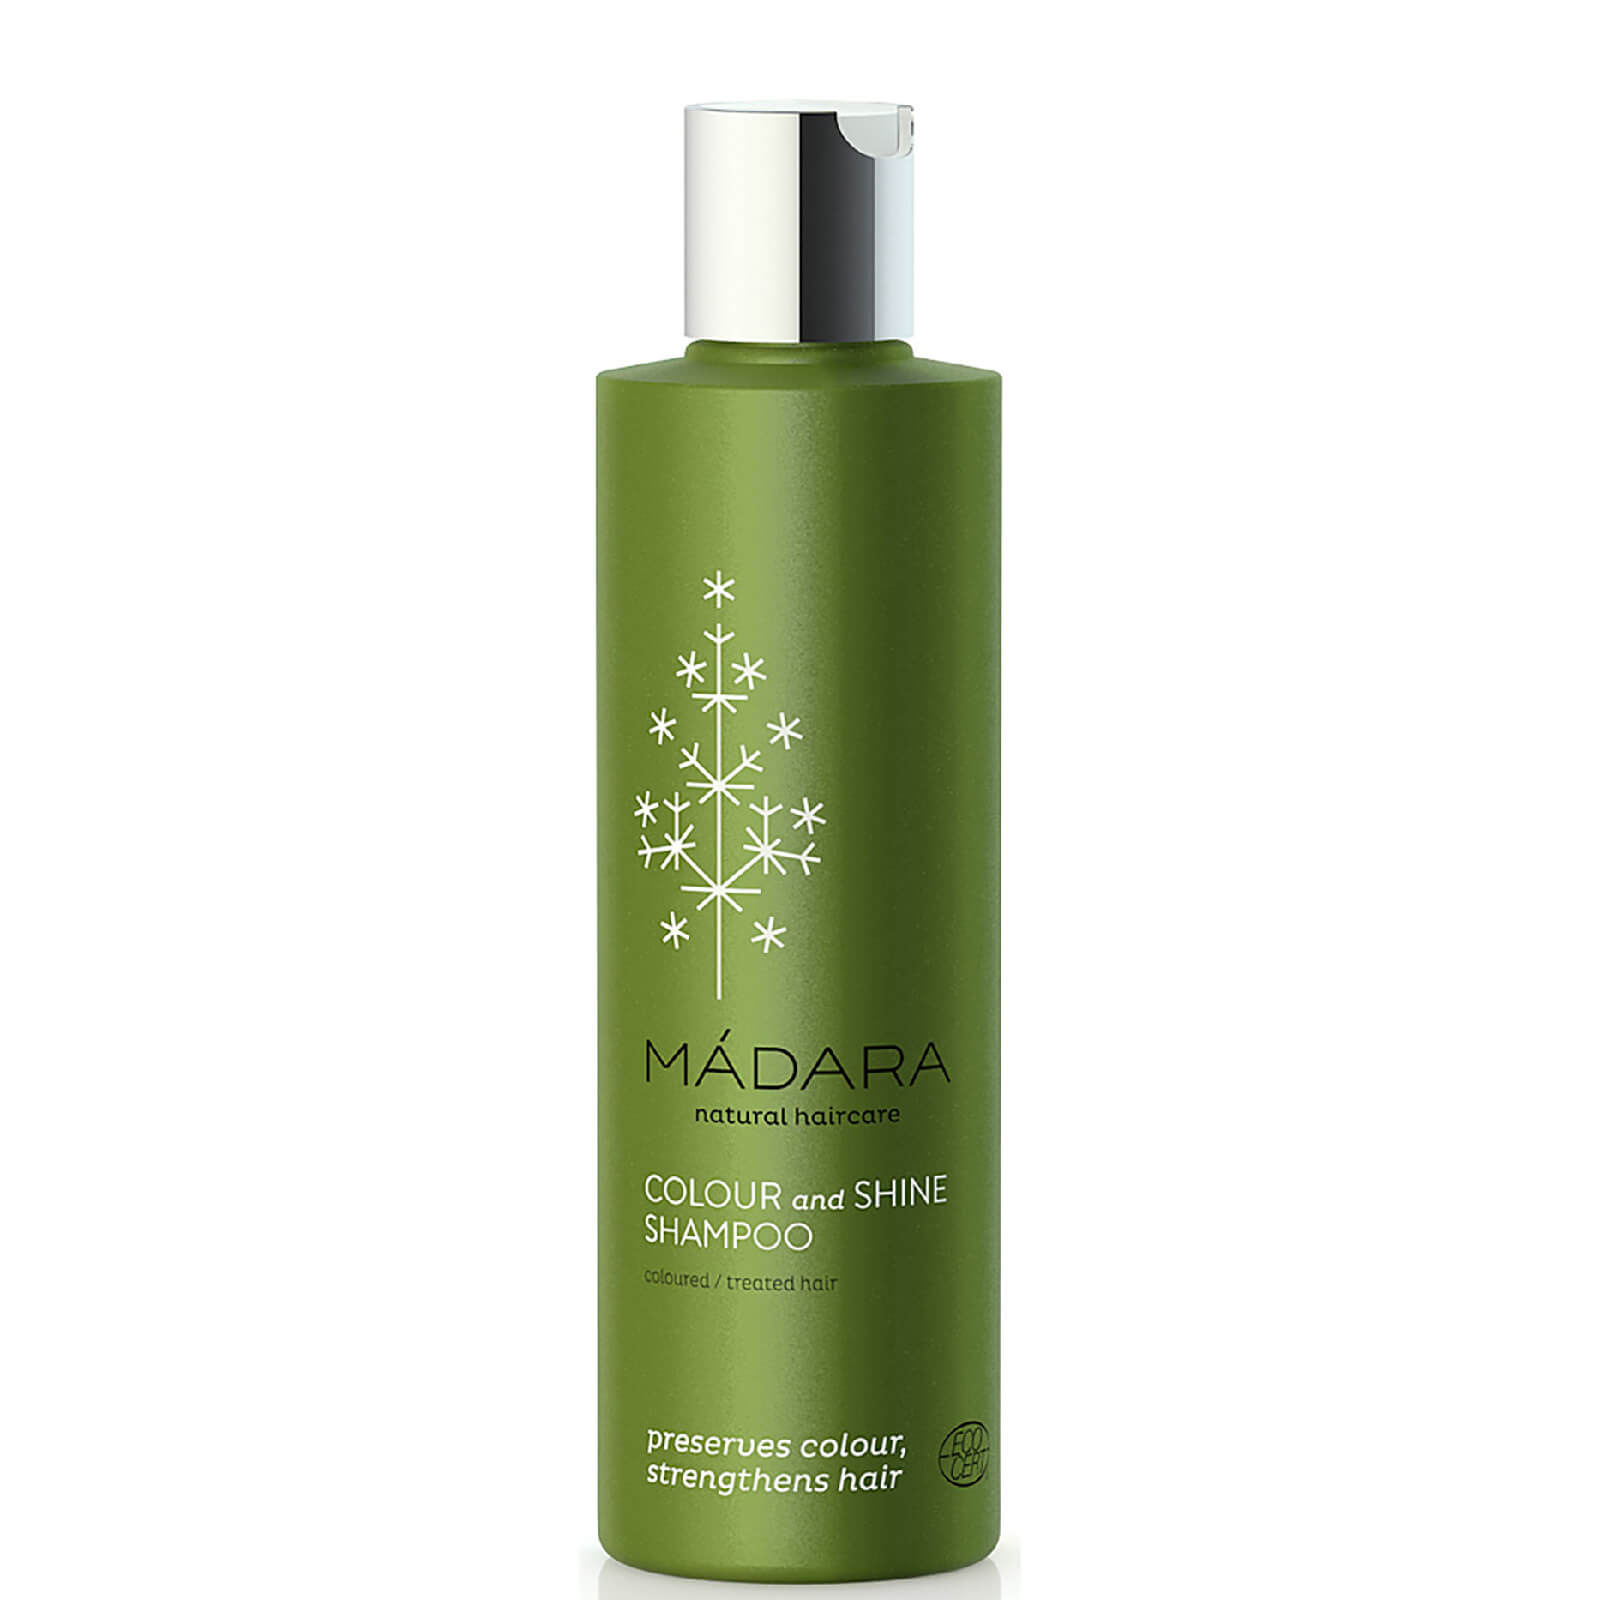 MÁDARA Colour and Shine Shampoo 250 ml